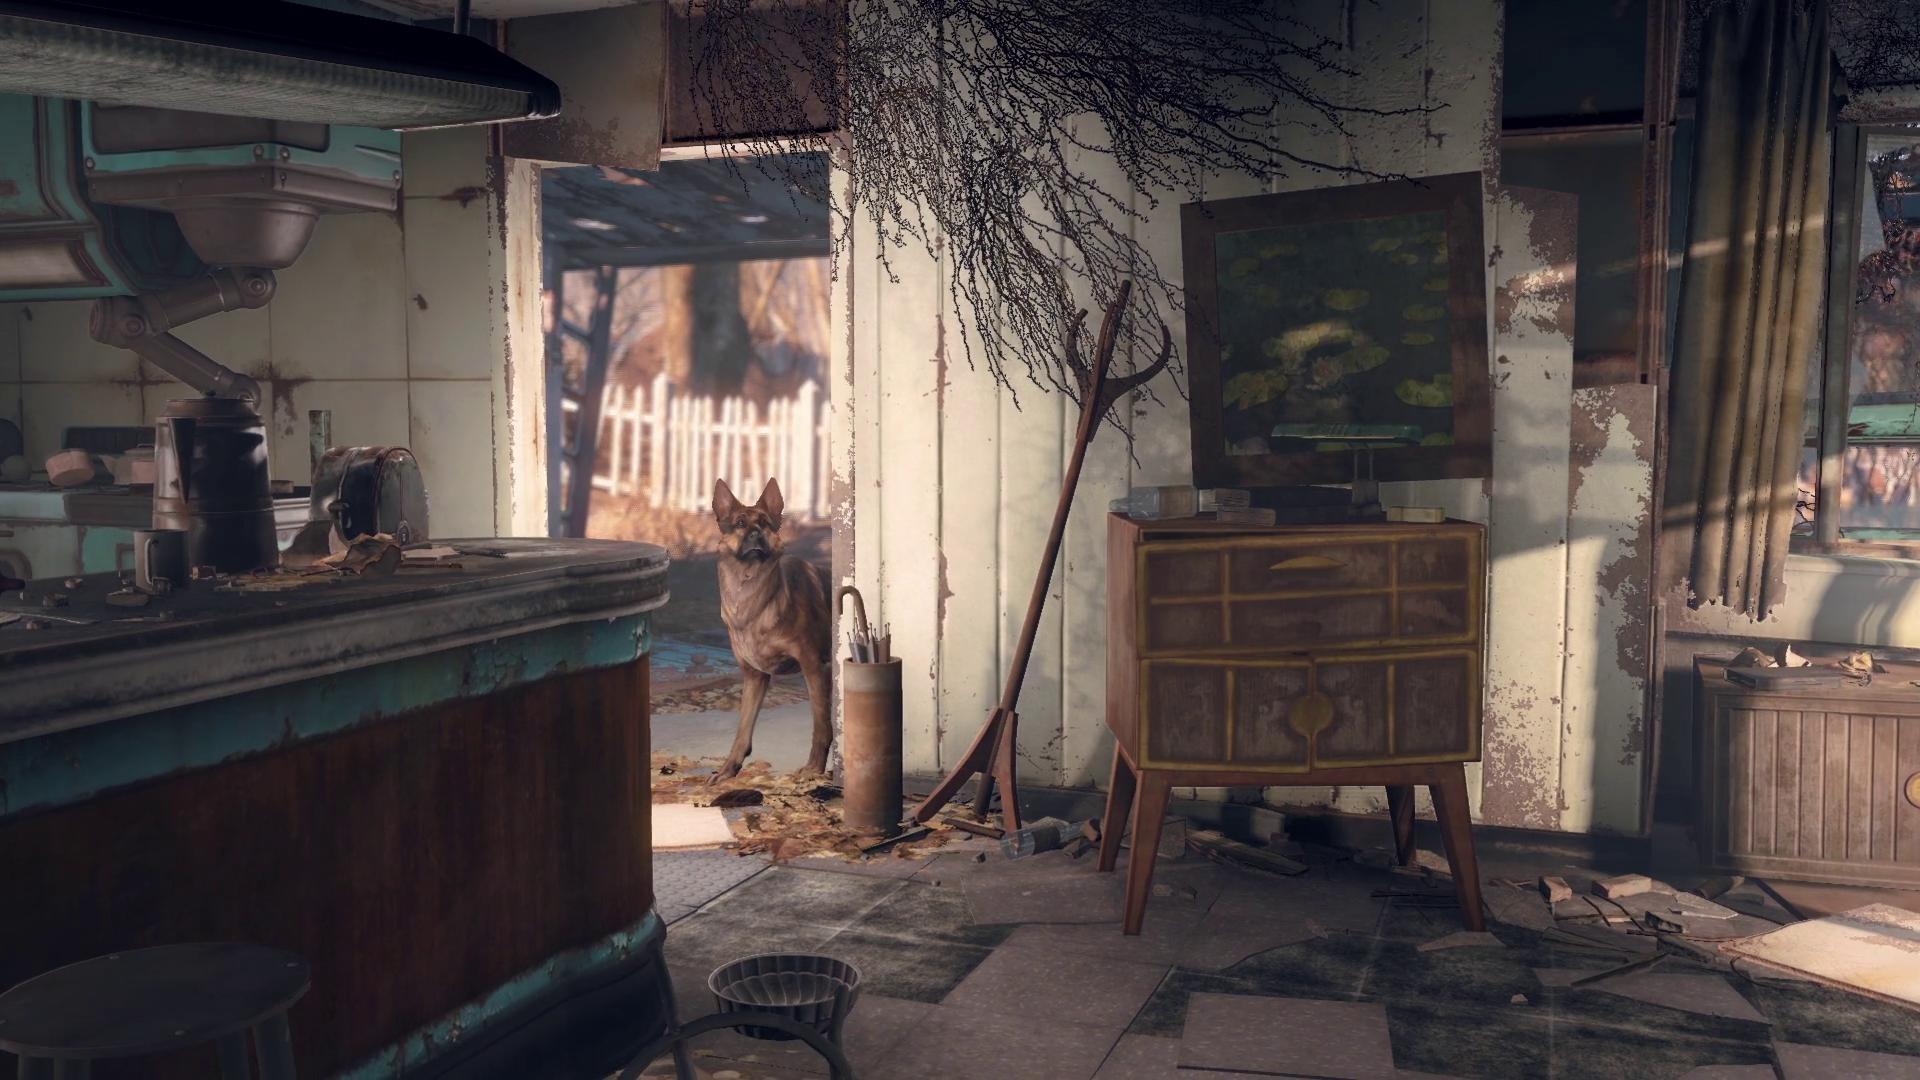 fallout 4 garage wallpaper images (14)